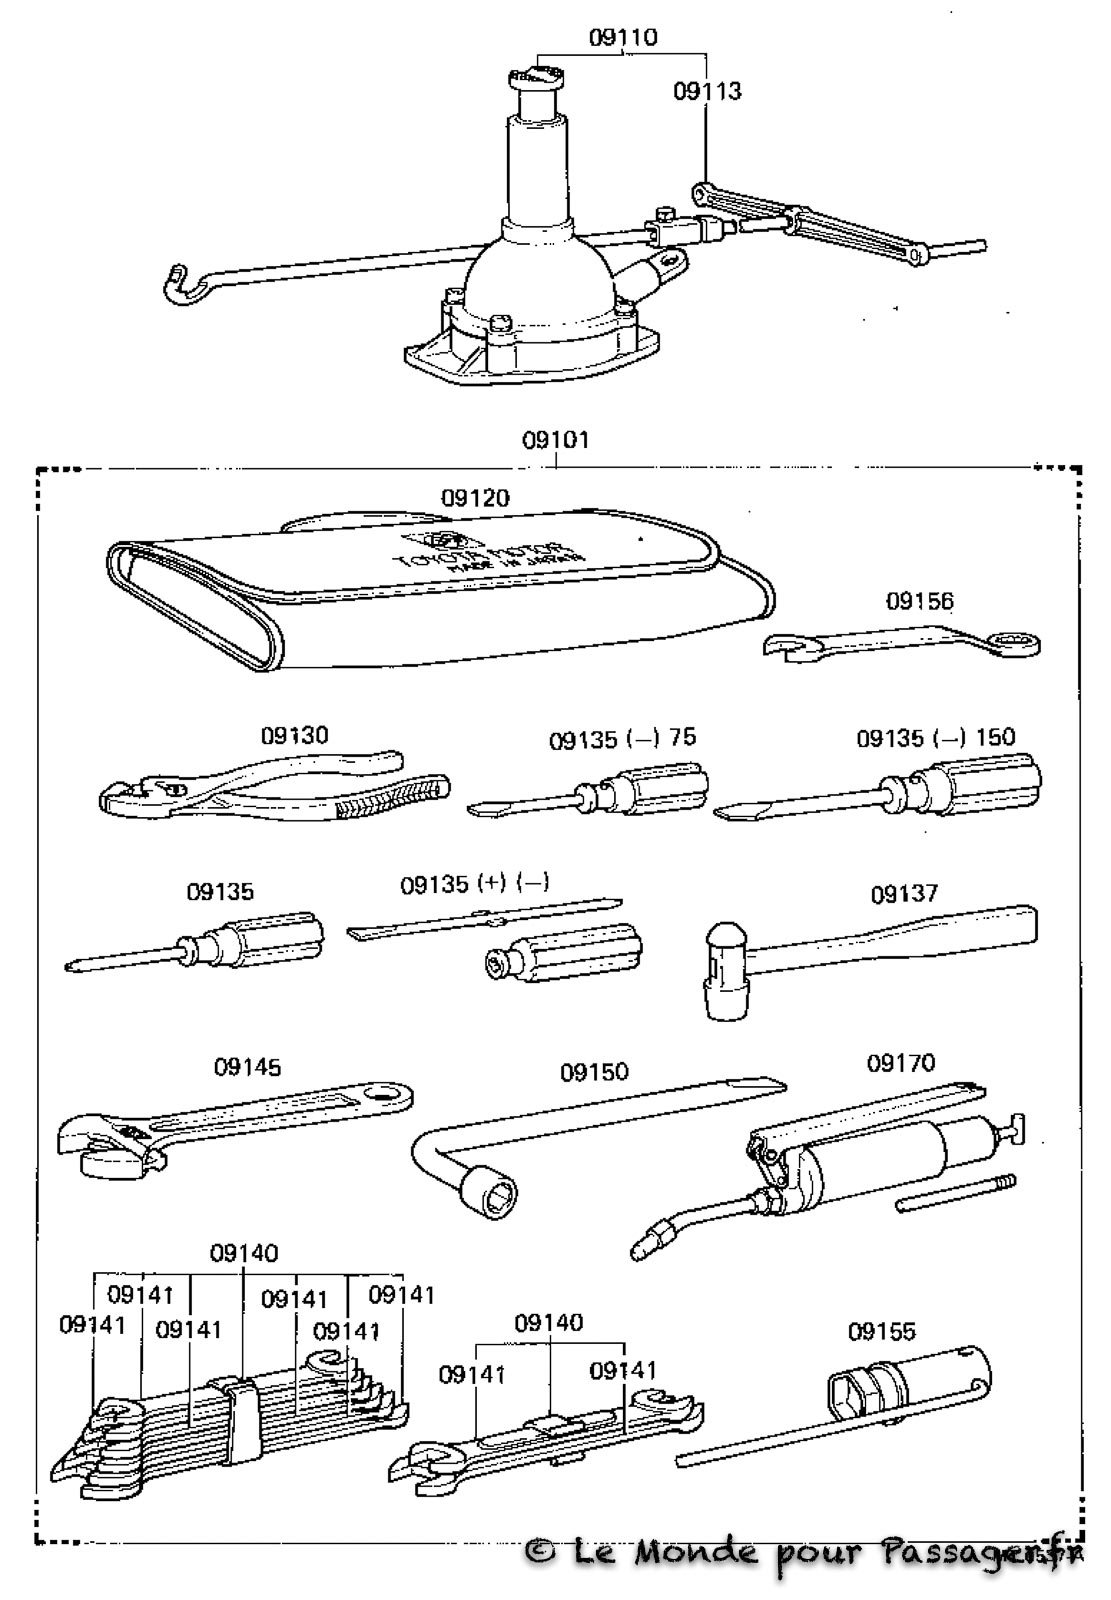 Fj55-Eclatés-Techniques121